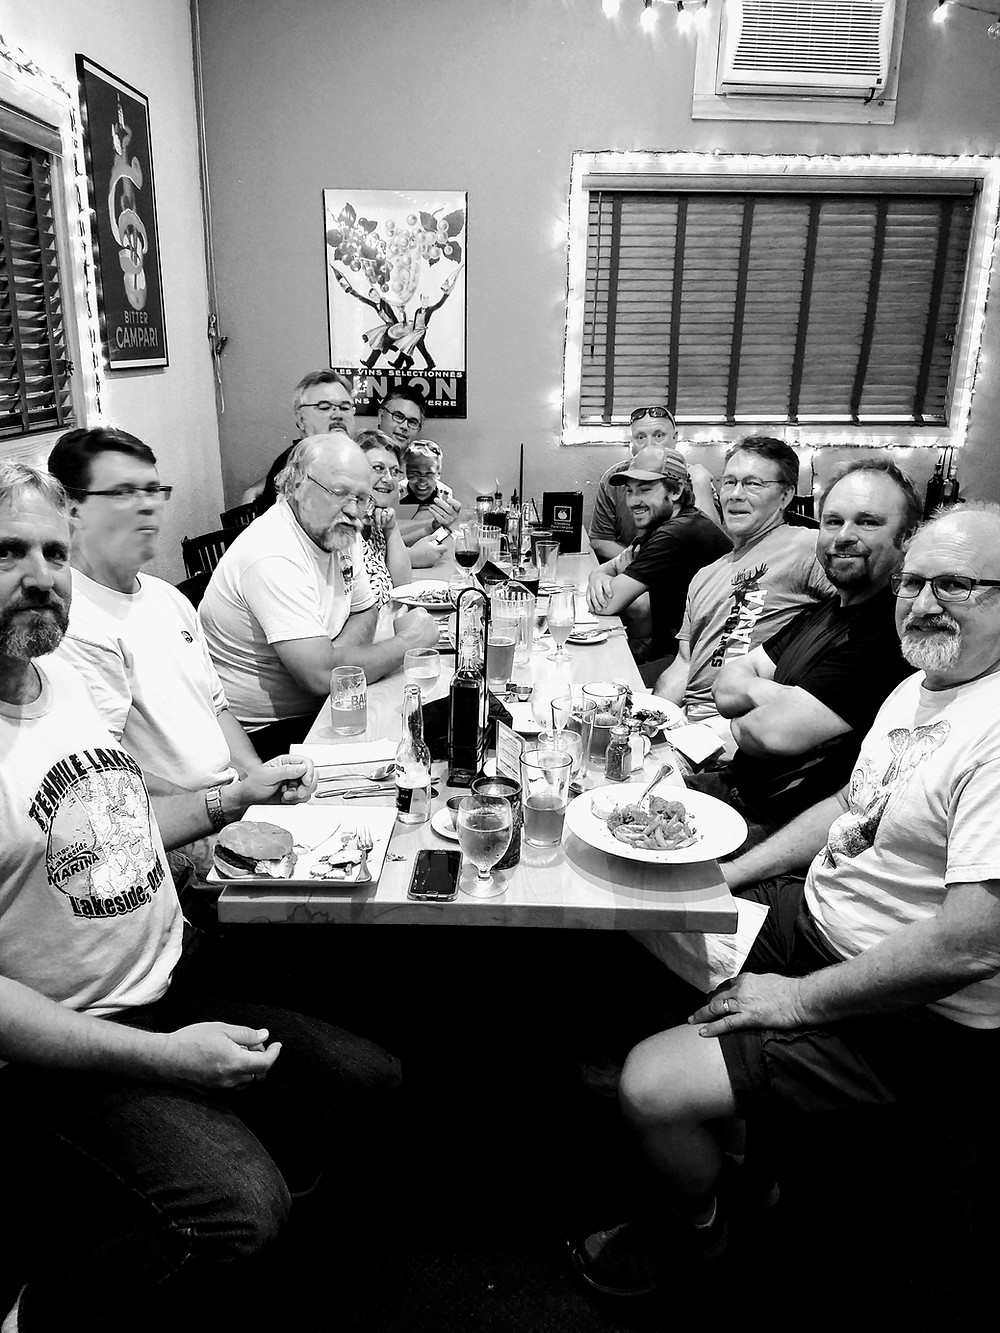 Dinner in Ellensburg, WA